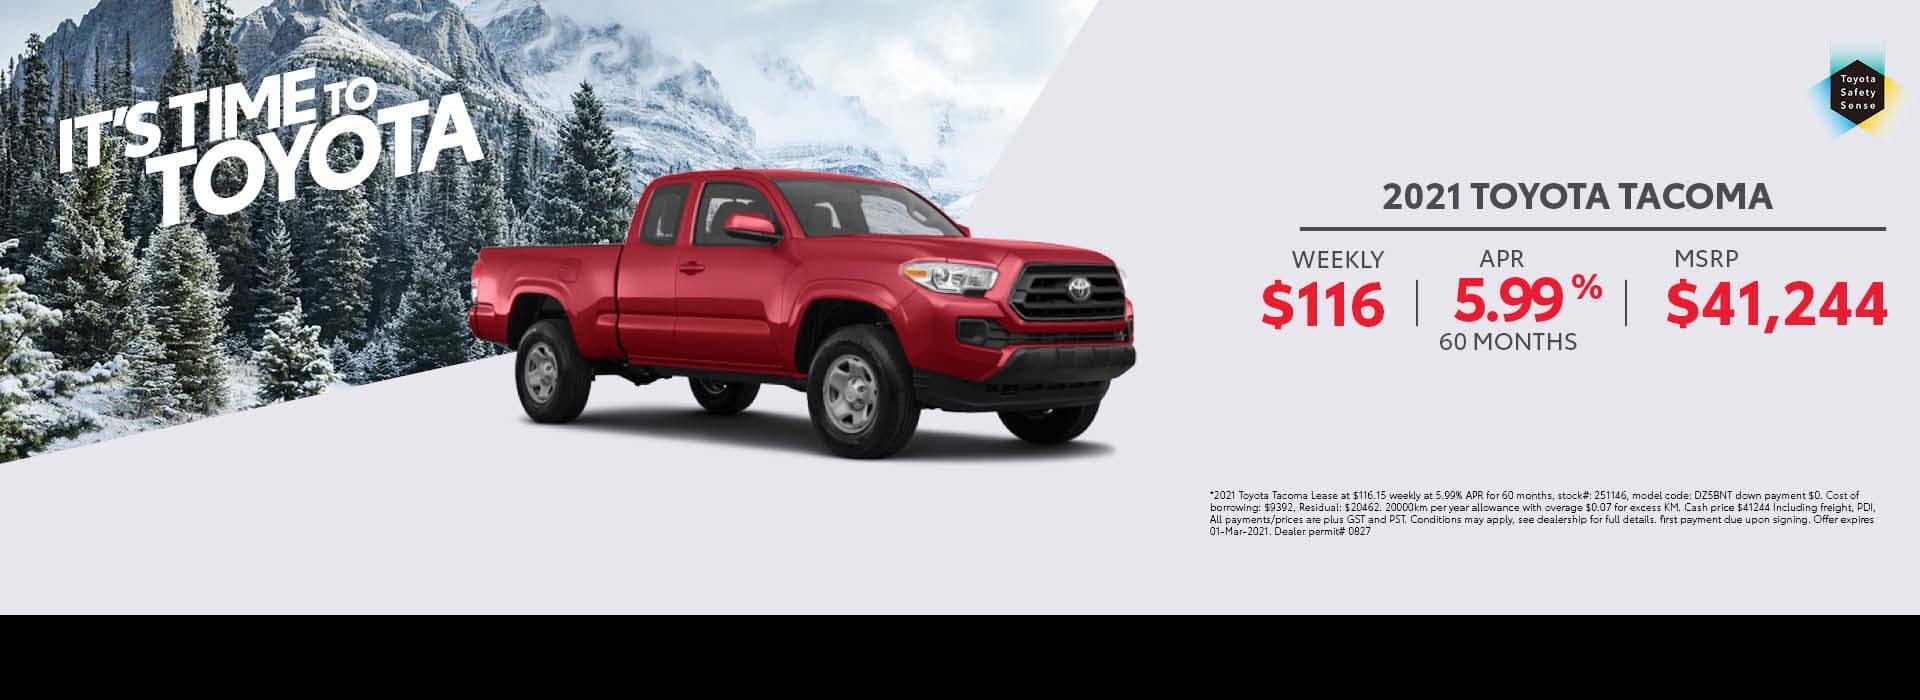 2021_Toyota_Tacoma_Desktop_Home_Page_Banner_Feb202110